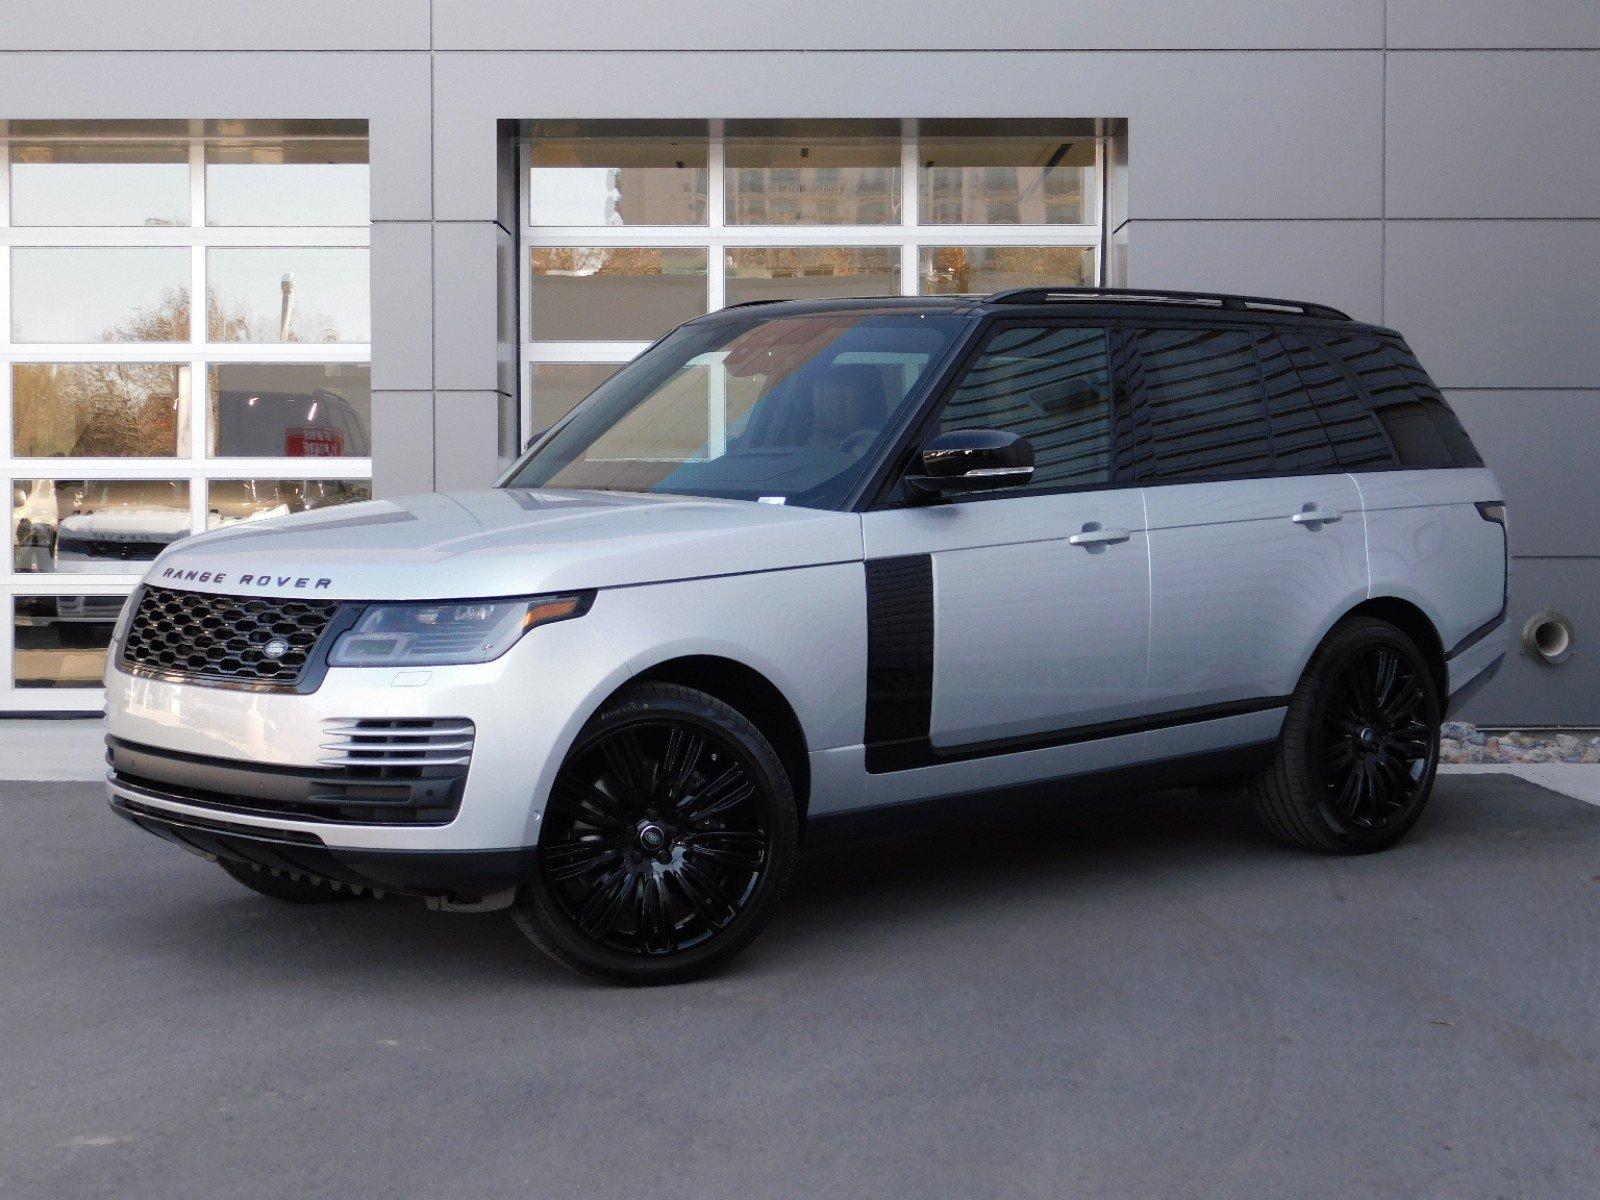 New 2020 Land Rover Range Rover P525 Hse Sport Utility 1r0128 Ken Garff Automotive Group